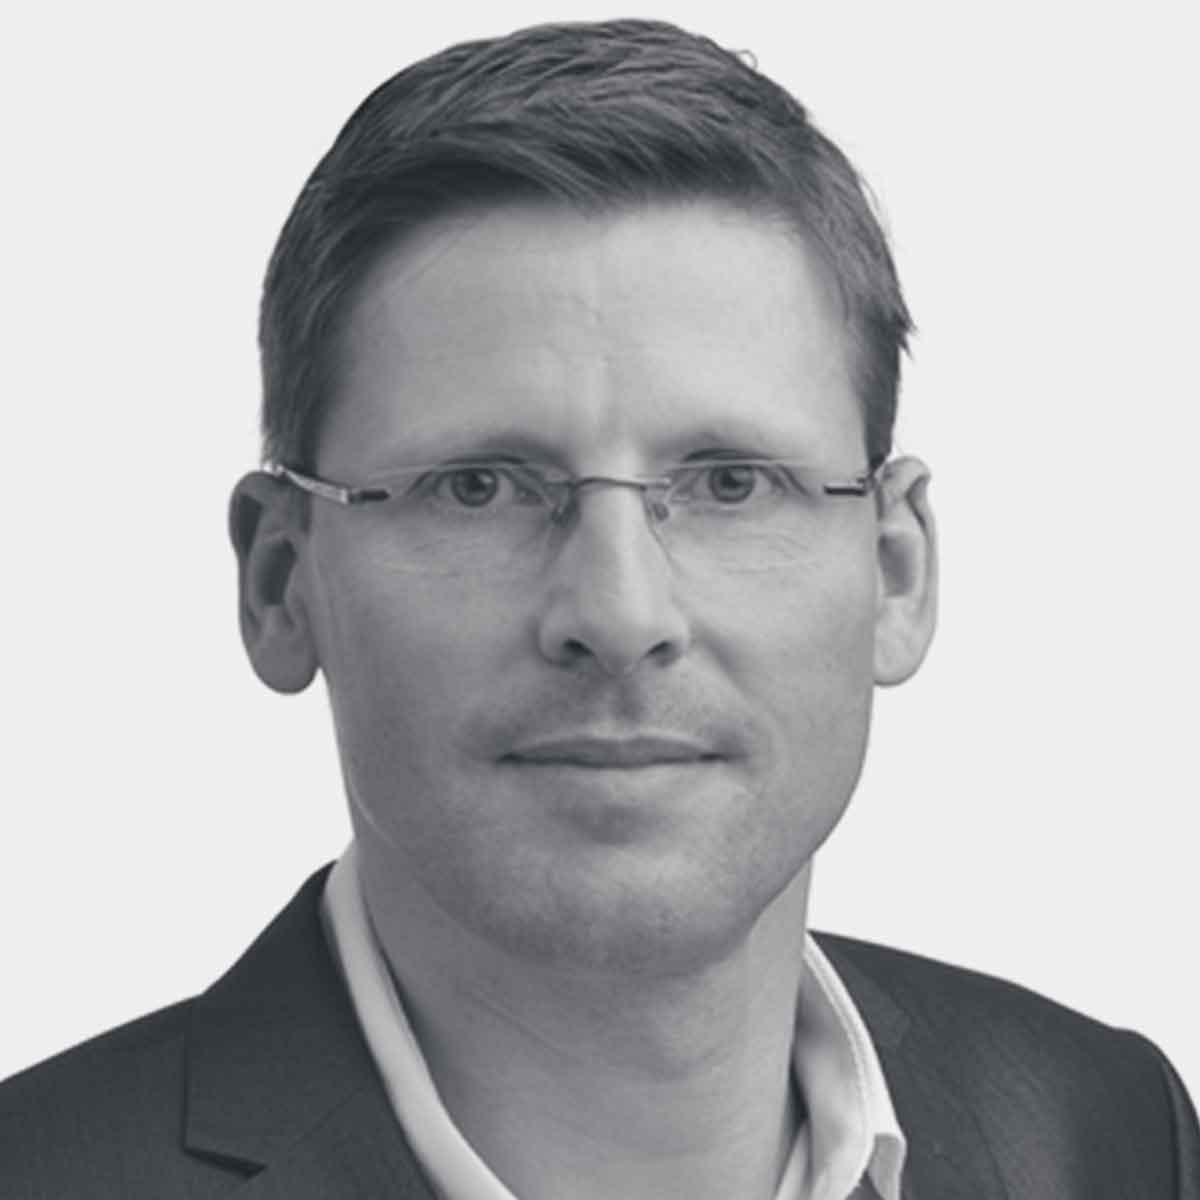 Tim Weingärtner